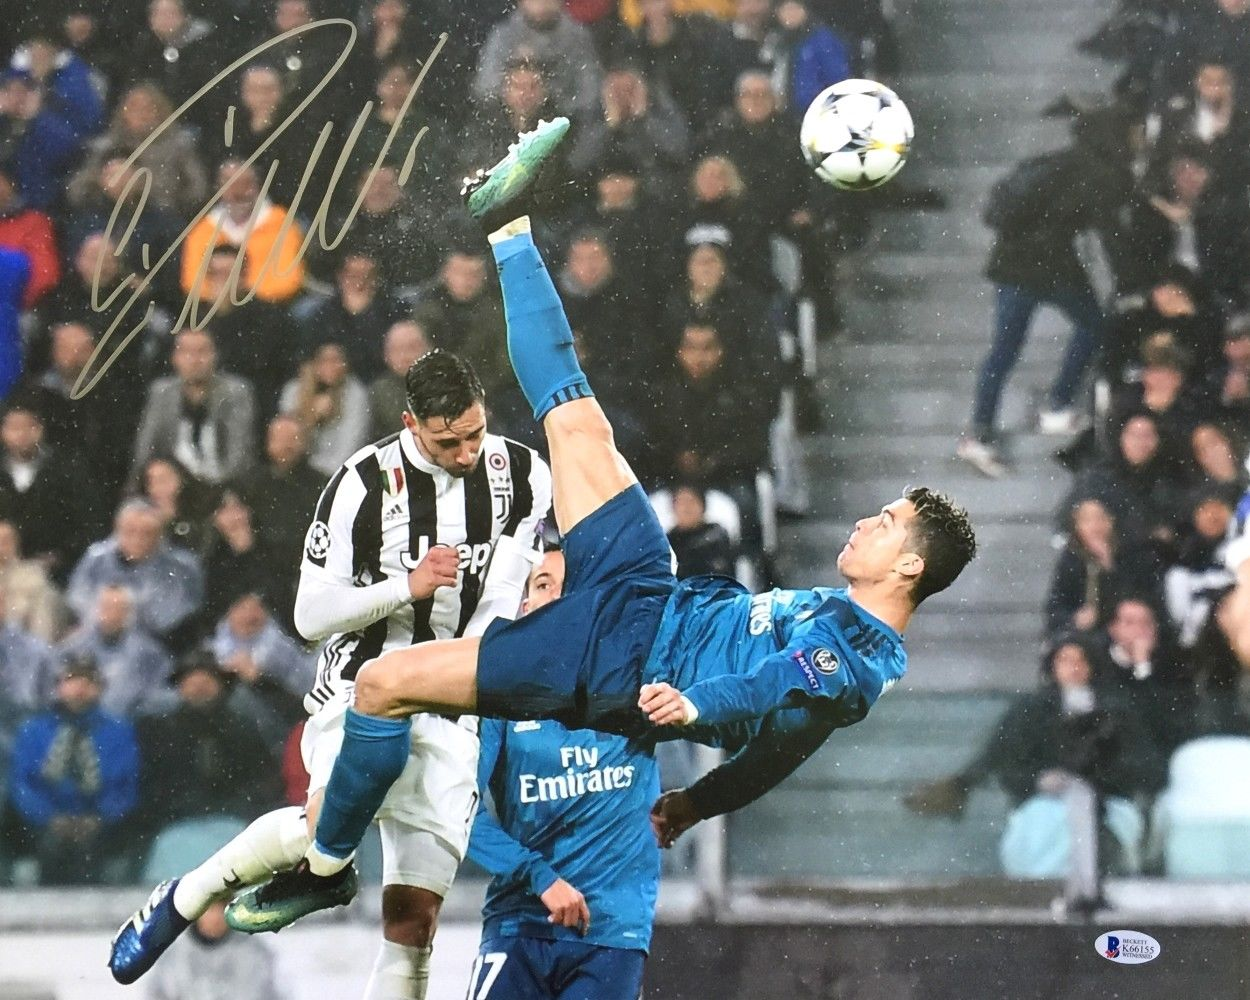 e3e8050ac92 Cristiano Ronaldo Portugal Autographed Signed 16x20 Photo Beckett ...